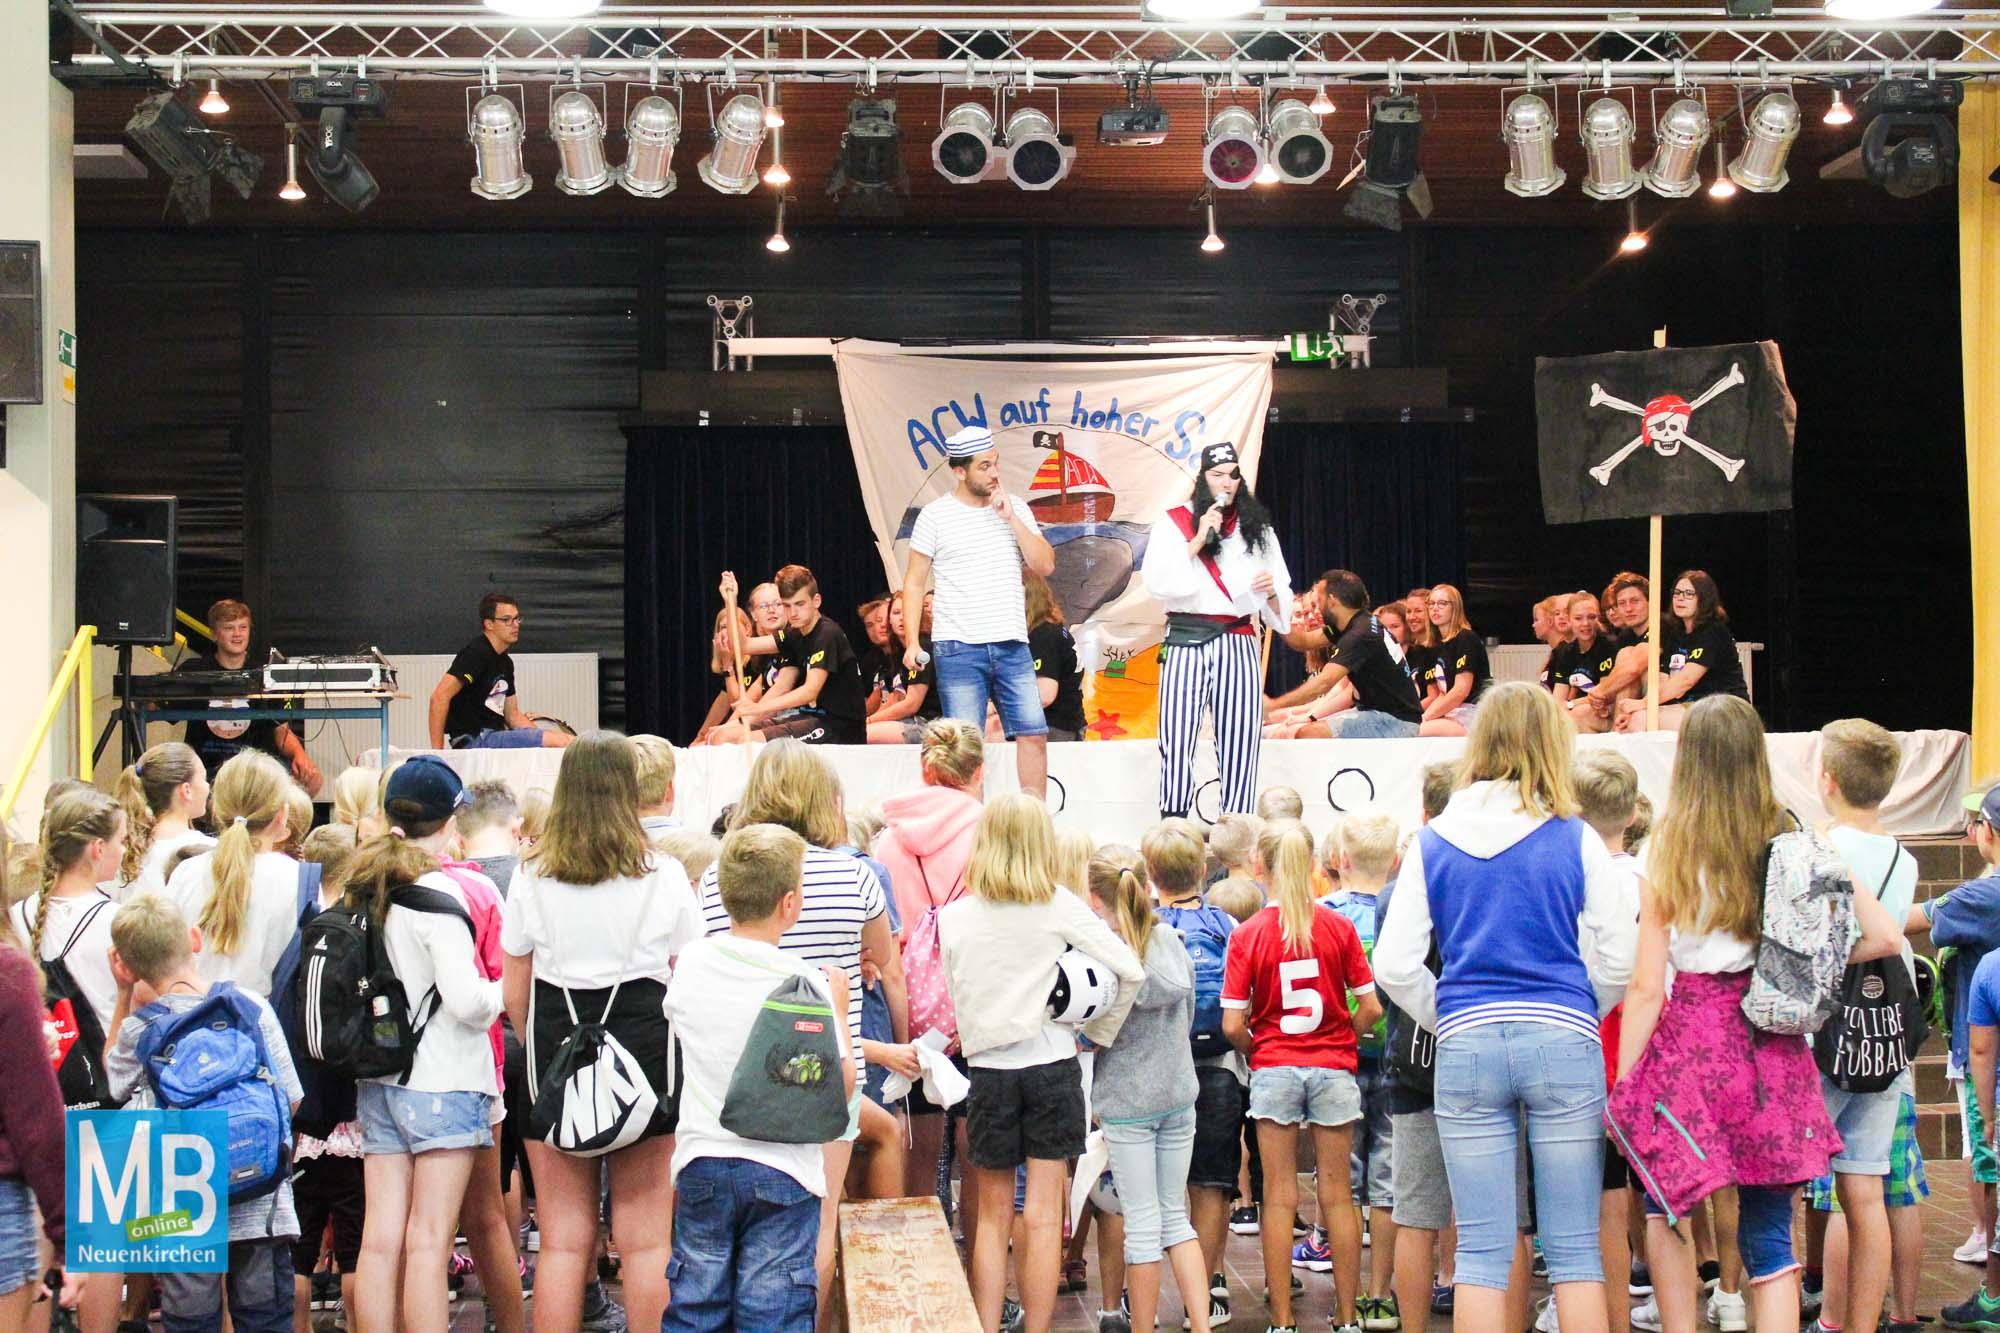 Buntes Programm bei der CAJ-Actionwoche 2019 | Foto: Lea Helene Kaumanns